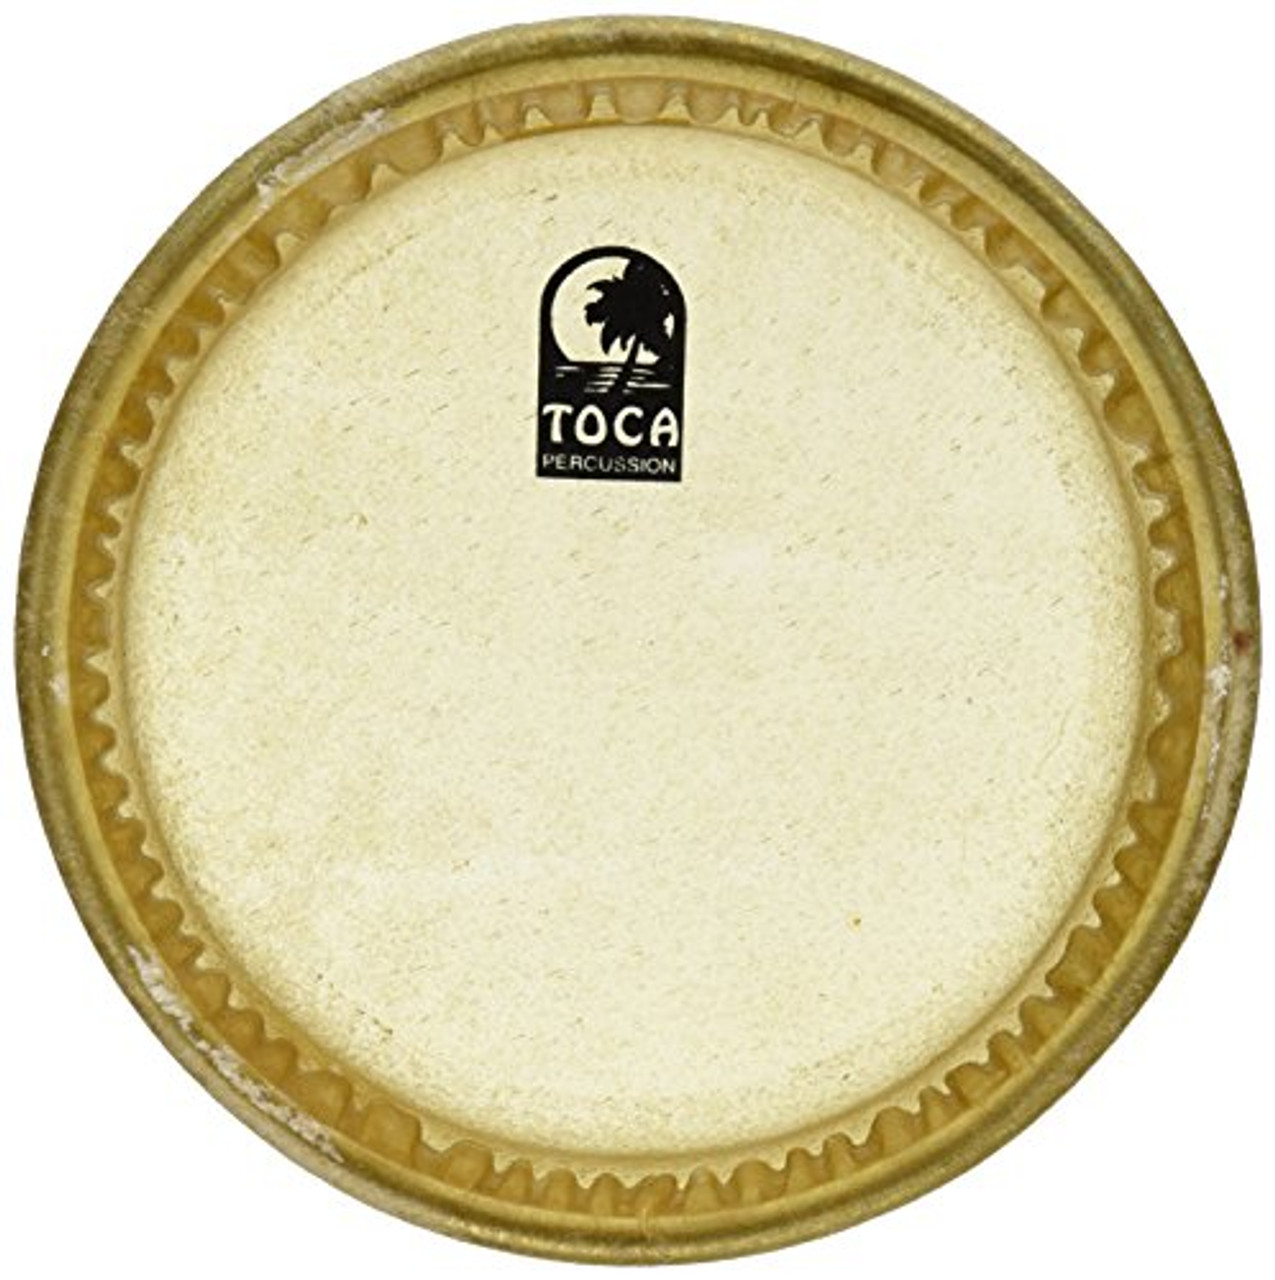 "Toca a TP-33007 7"" Head For 3308 Small Bata Drum"